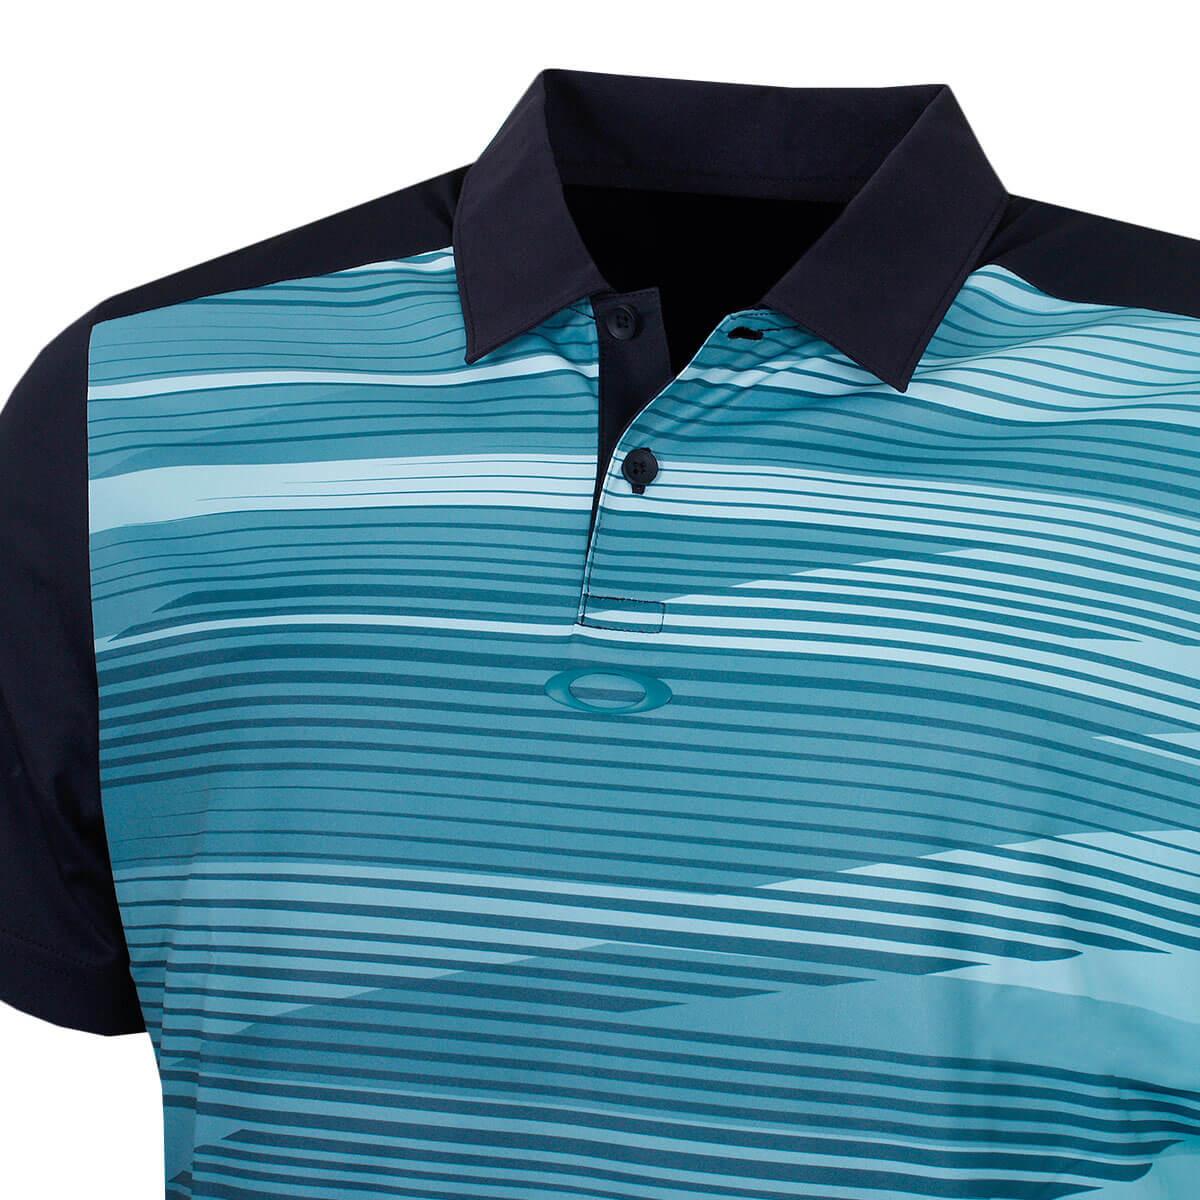 43415a33 ... Oakley Mens 2019 Ace SS Golf Polo Shirt. < Back. prev